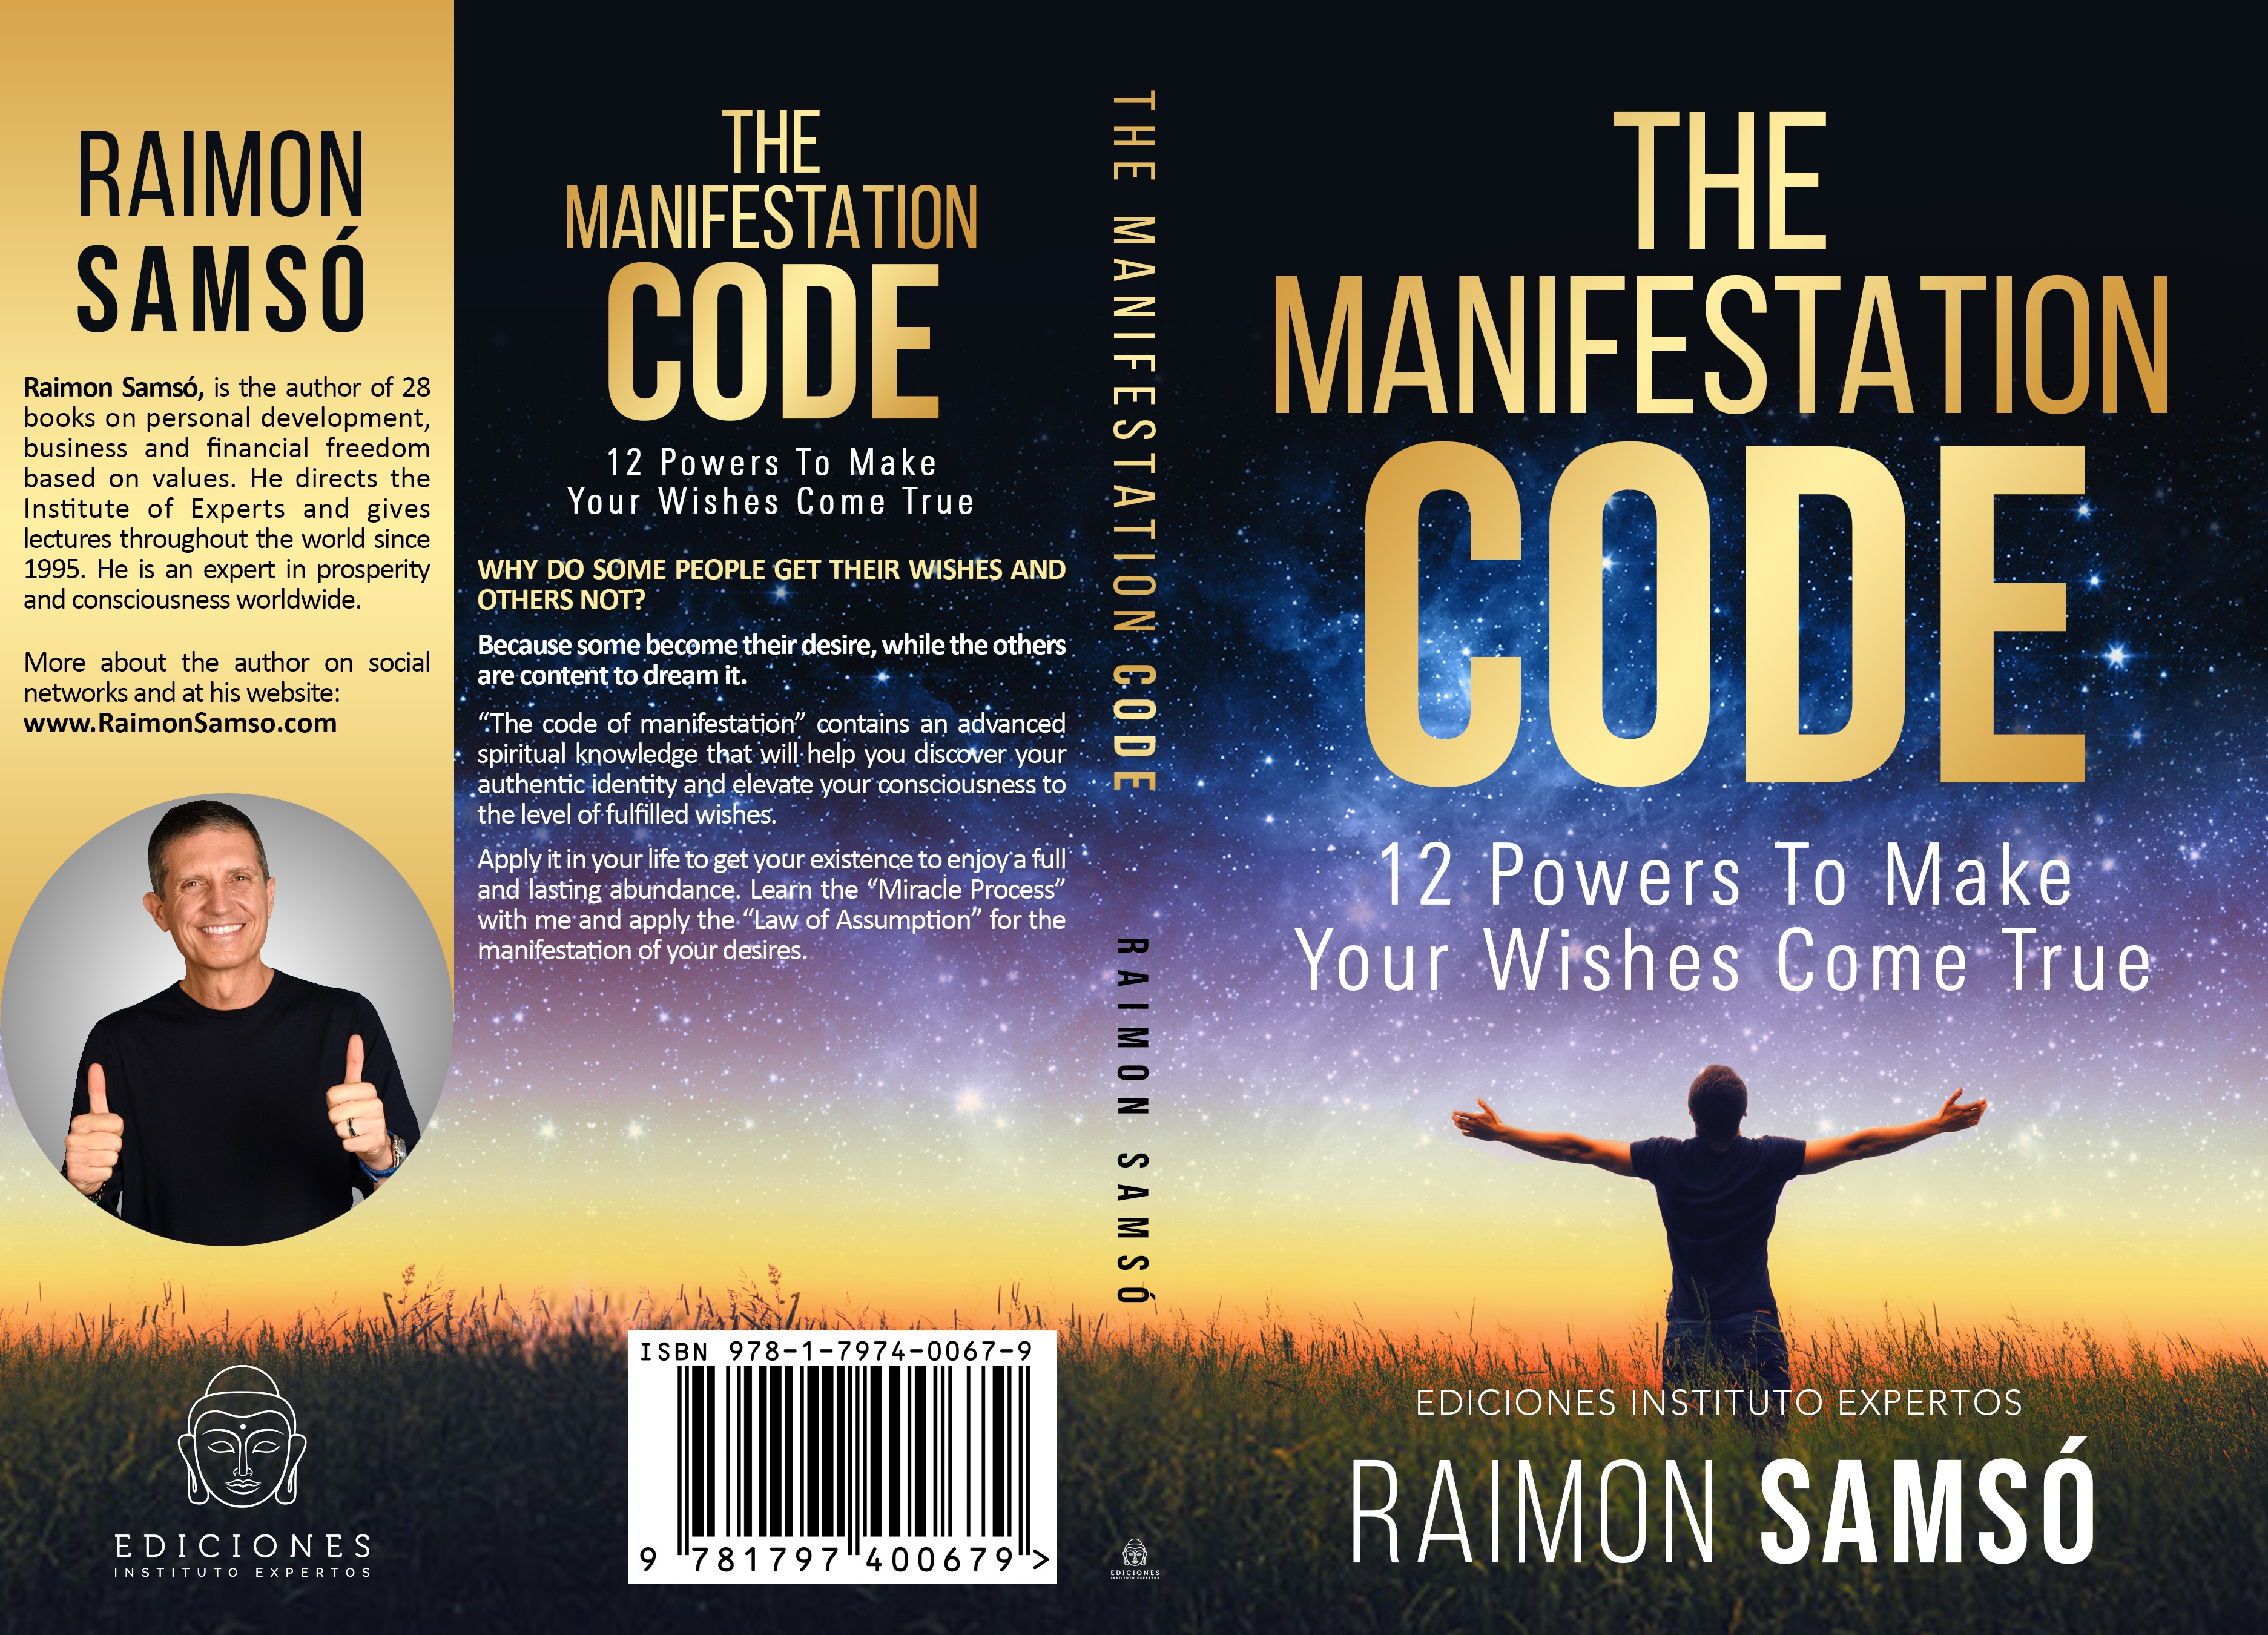 The Manifestation Code